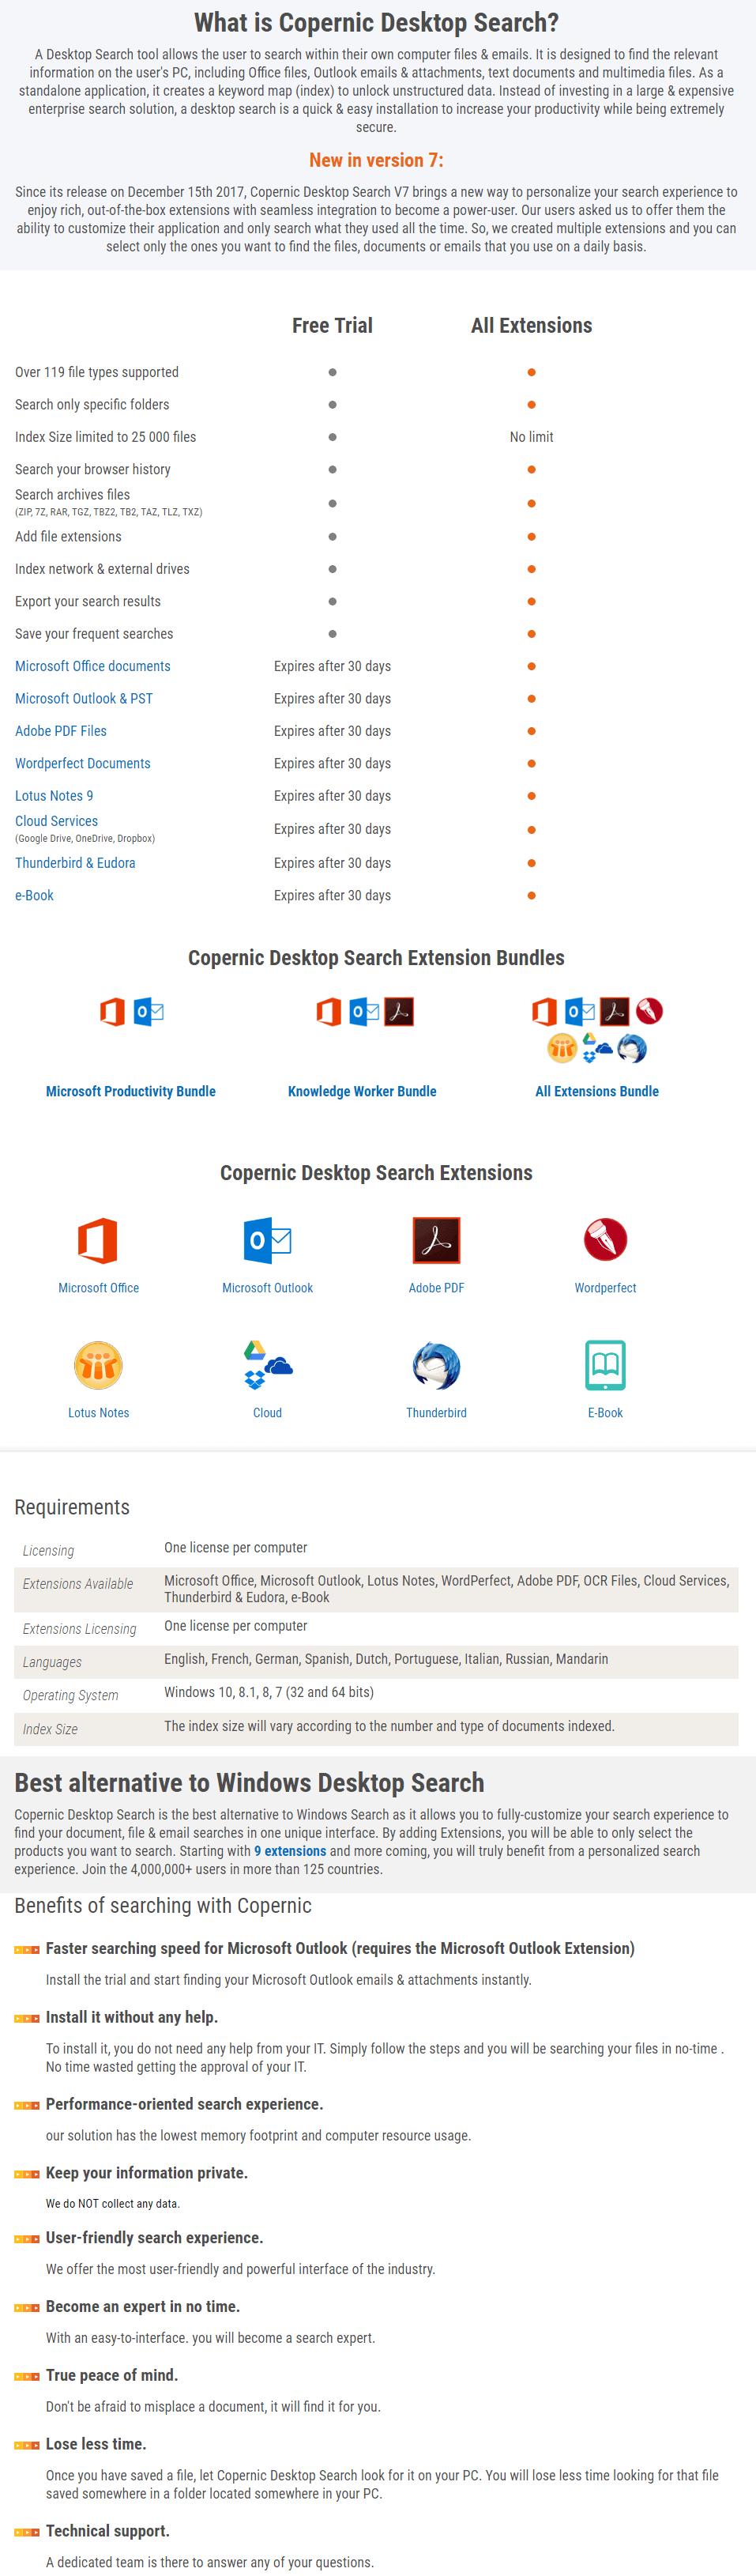 Copernic Desktop Search 30% Discount